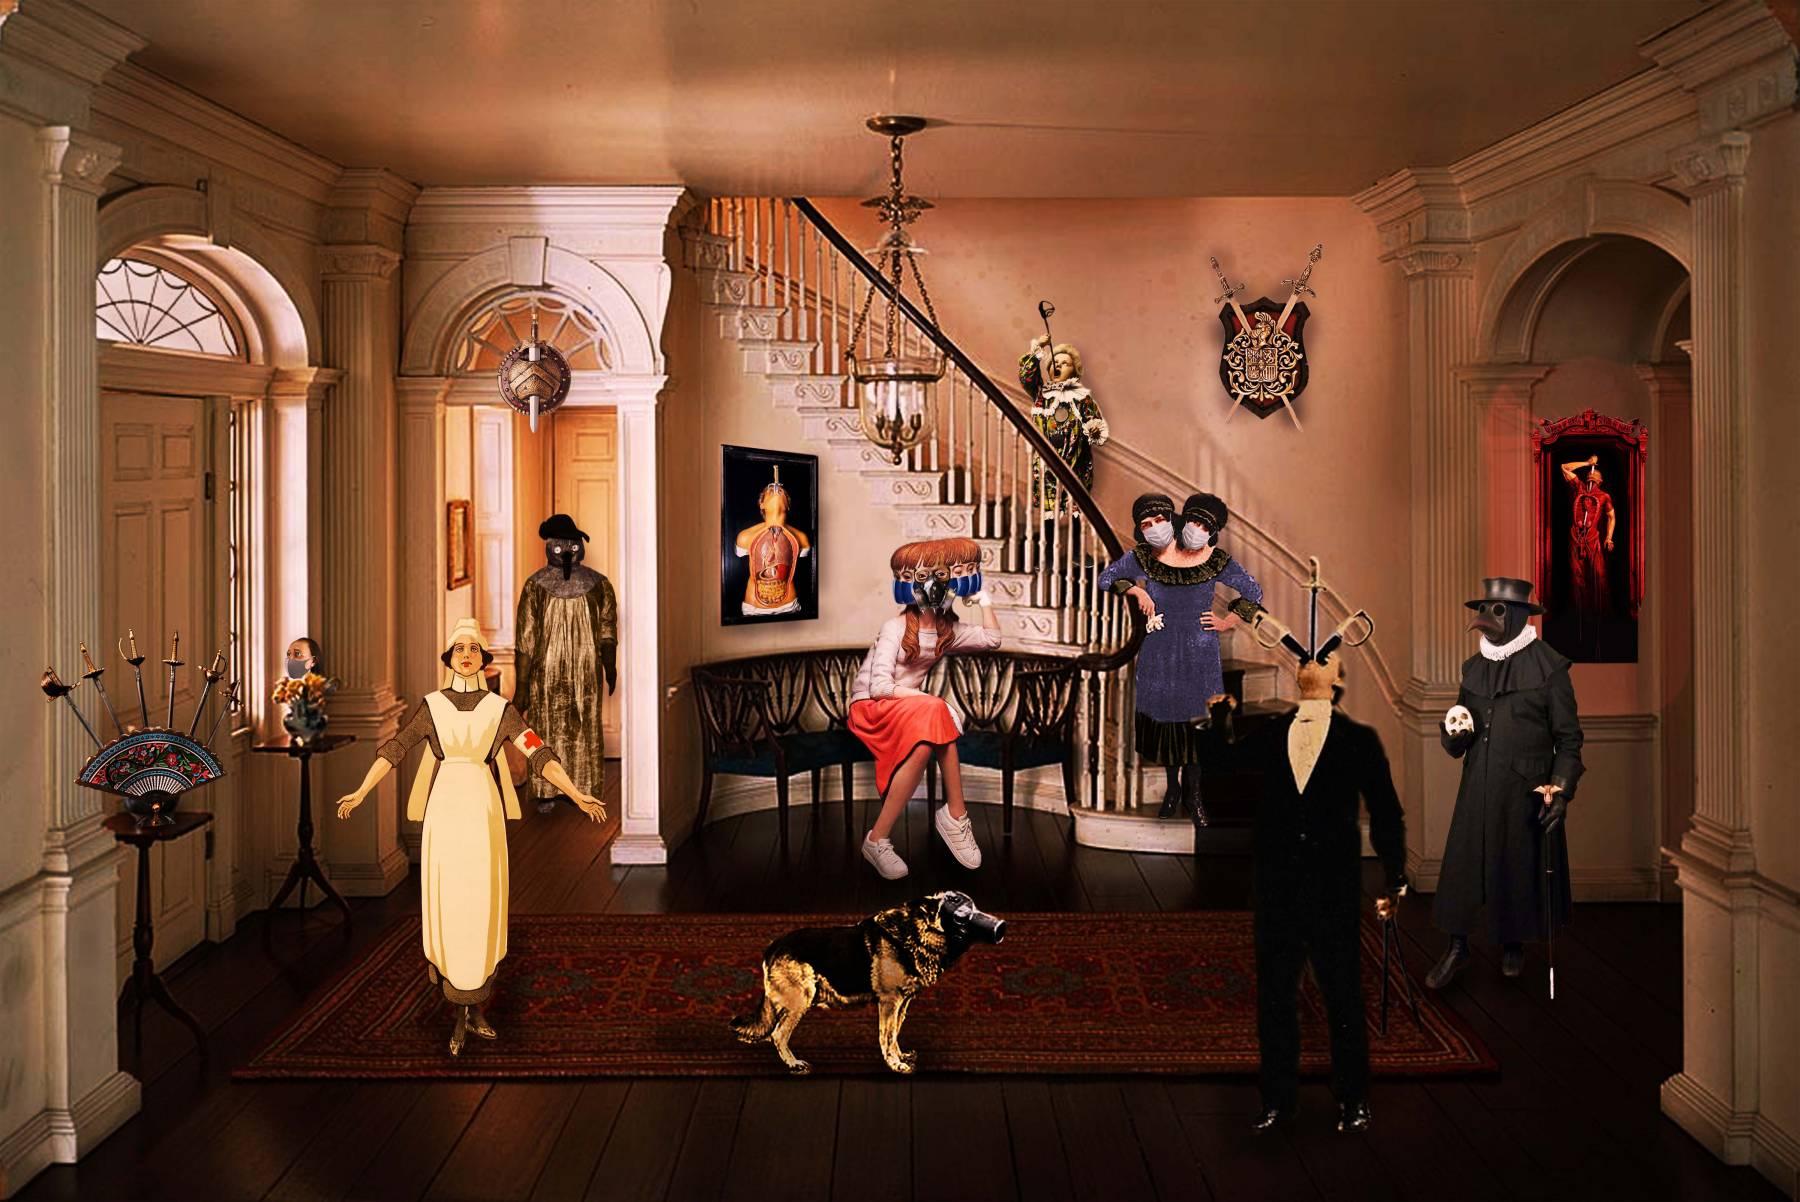 Cuarentena en casa de los tragasables (2020) - Carmen Michelena - Nonagraph